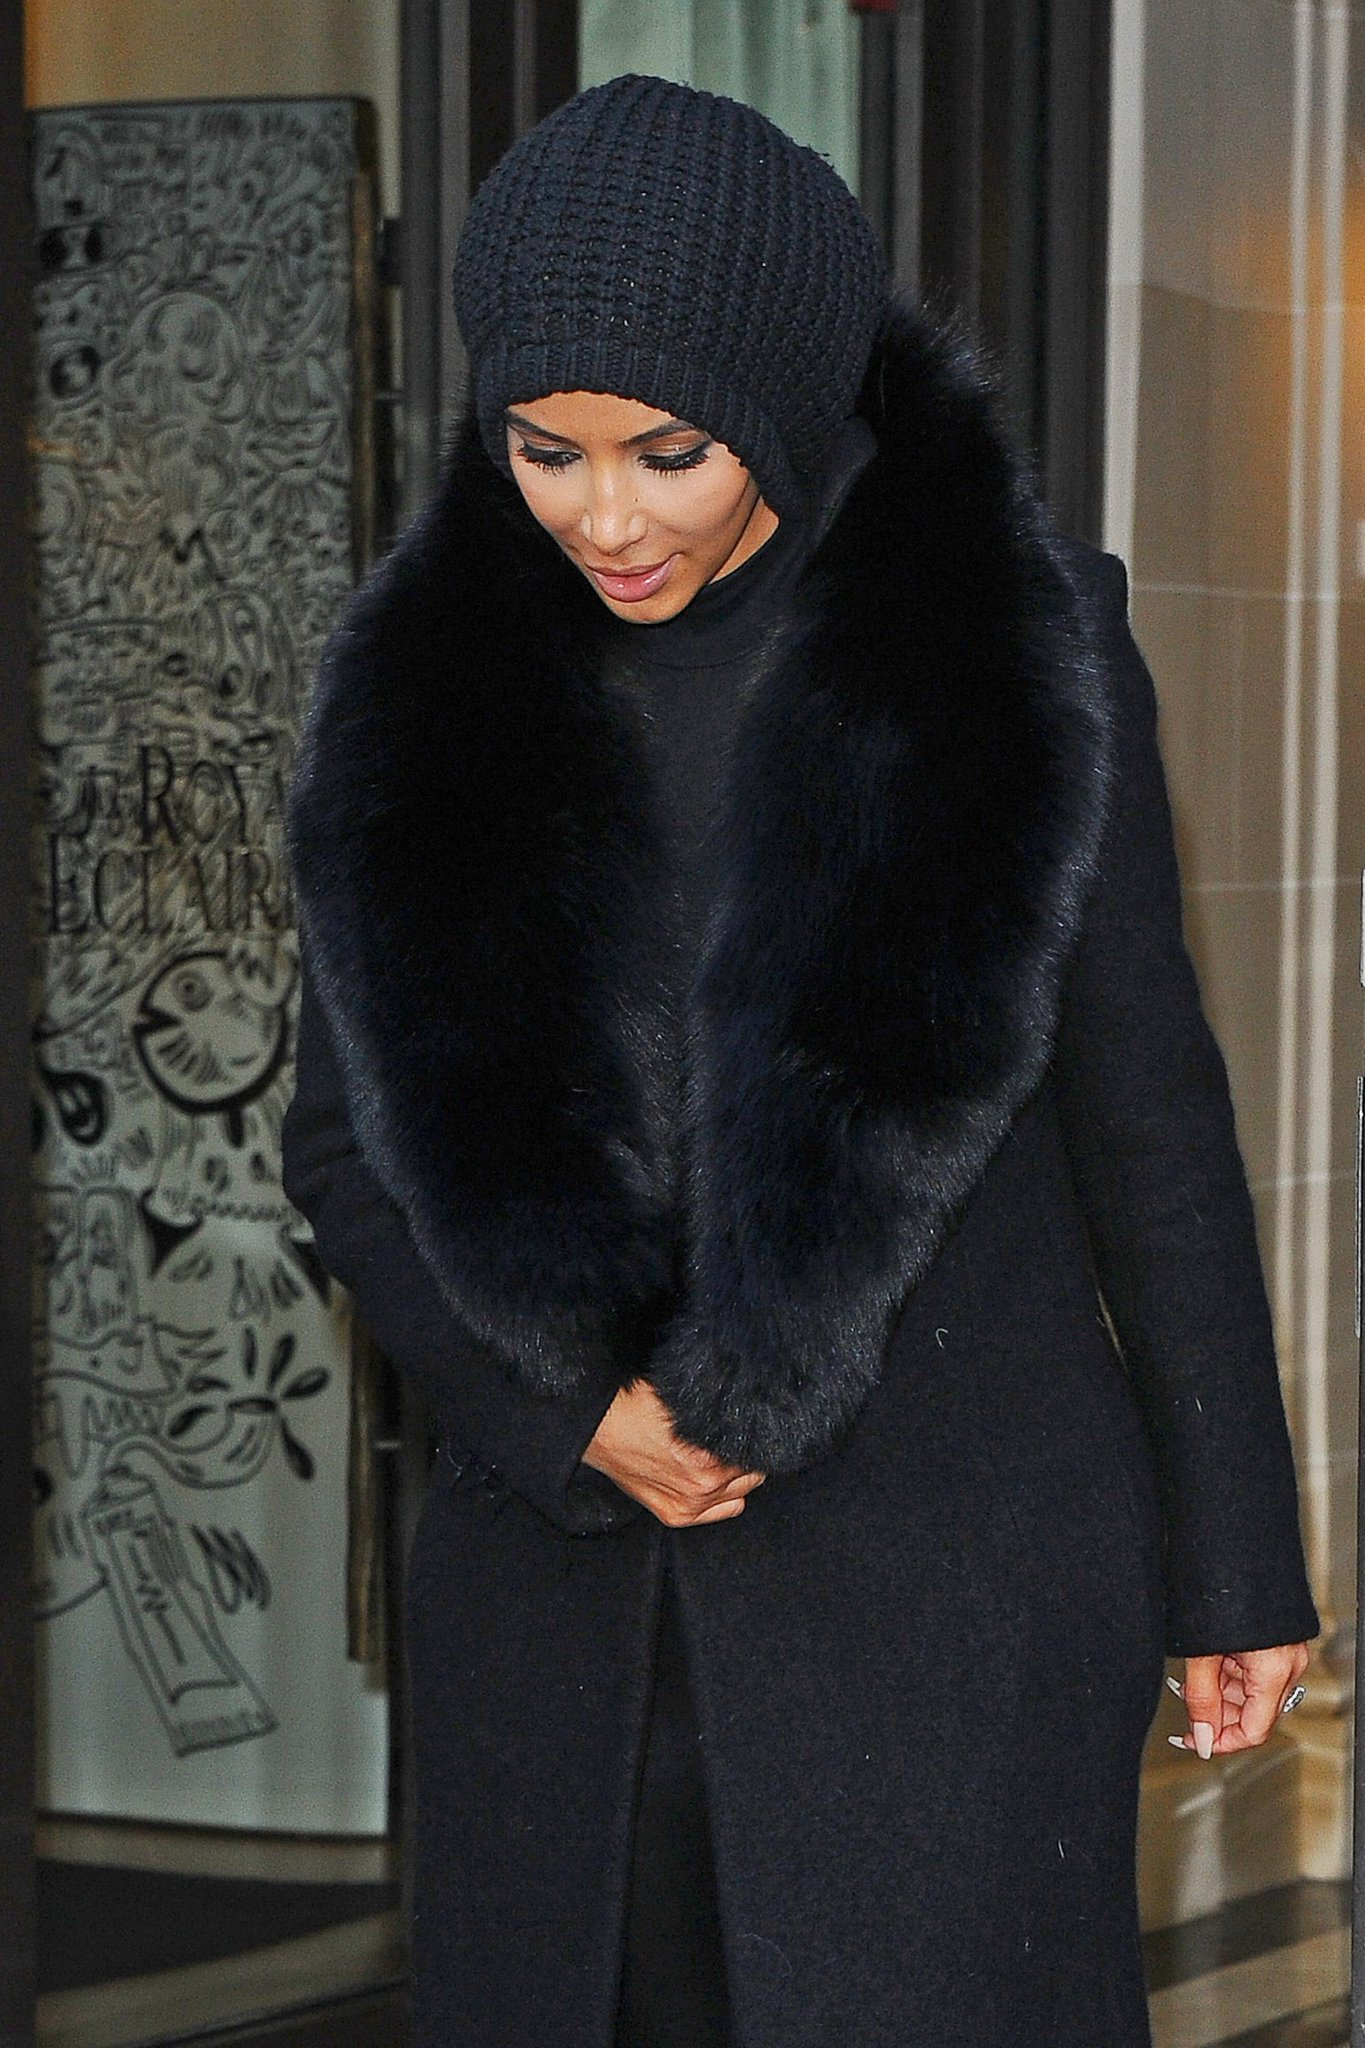 There's something hiding under #KimKardashian's beanie! http://t.co/YdSPCRSfIo http://t.co/SsZJkOciQp